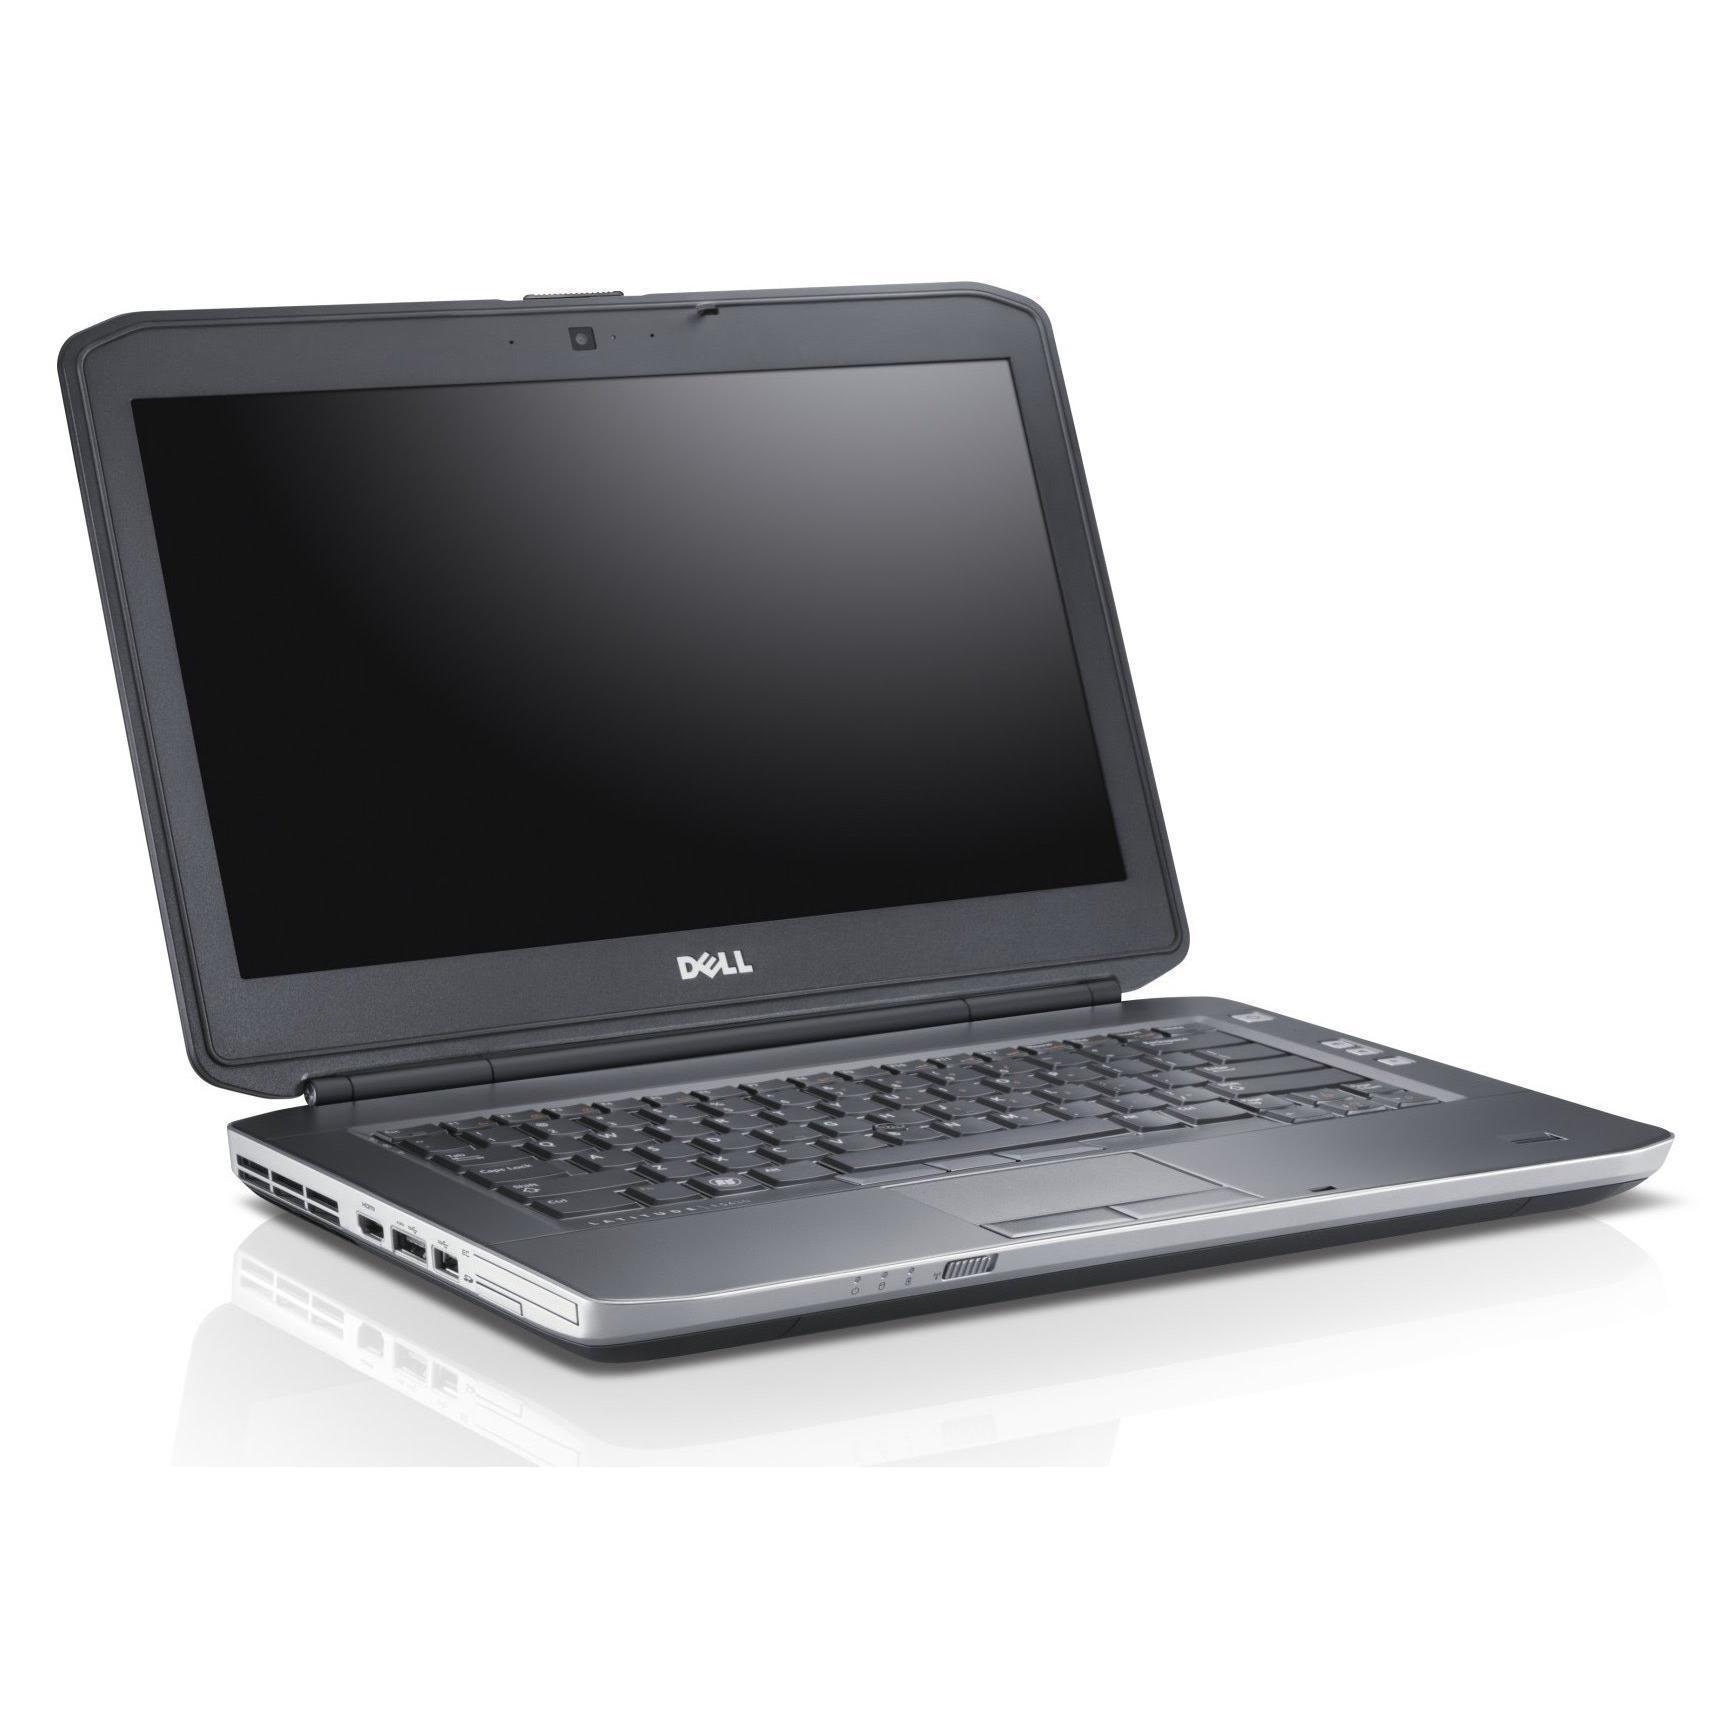 "PC Portable 14.1"" Dell Latitude E5430 - HD, Intel Celeron Dual Core B840, 4 Go RAM, HDD 320 Go, Windows 7 (Reconditionné)"